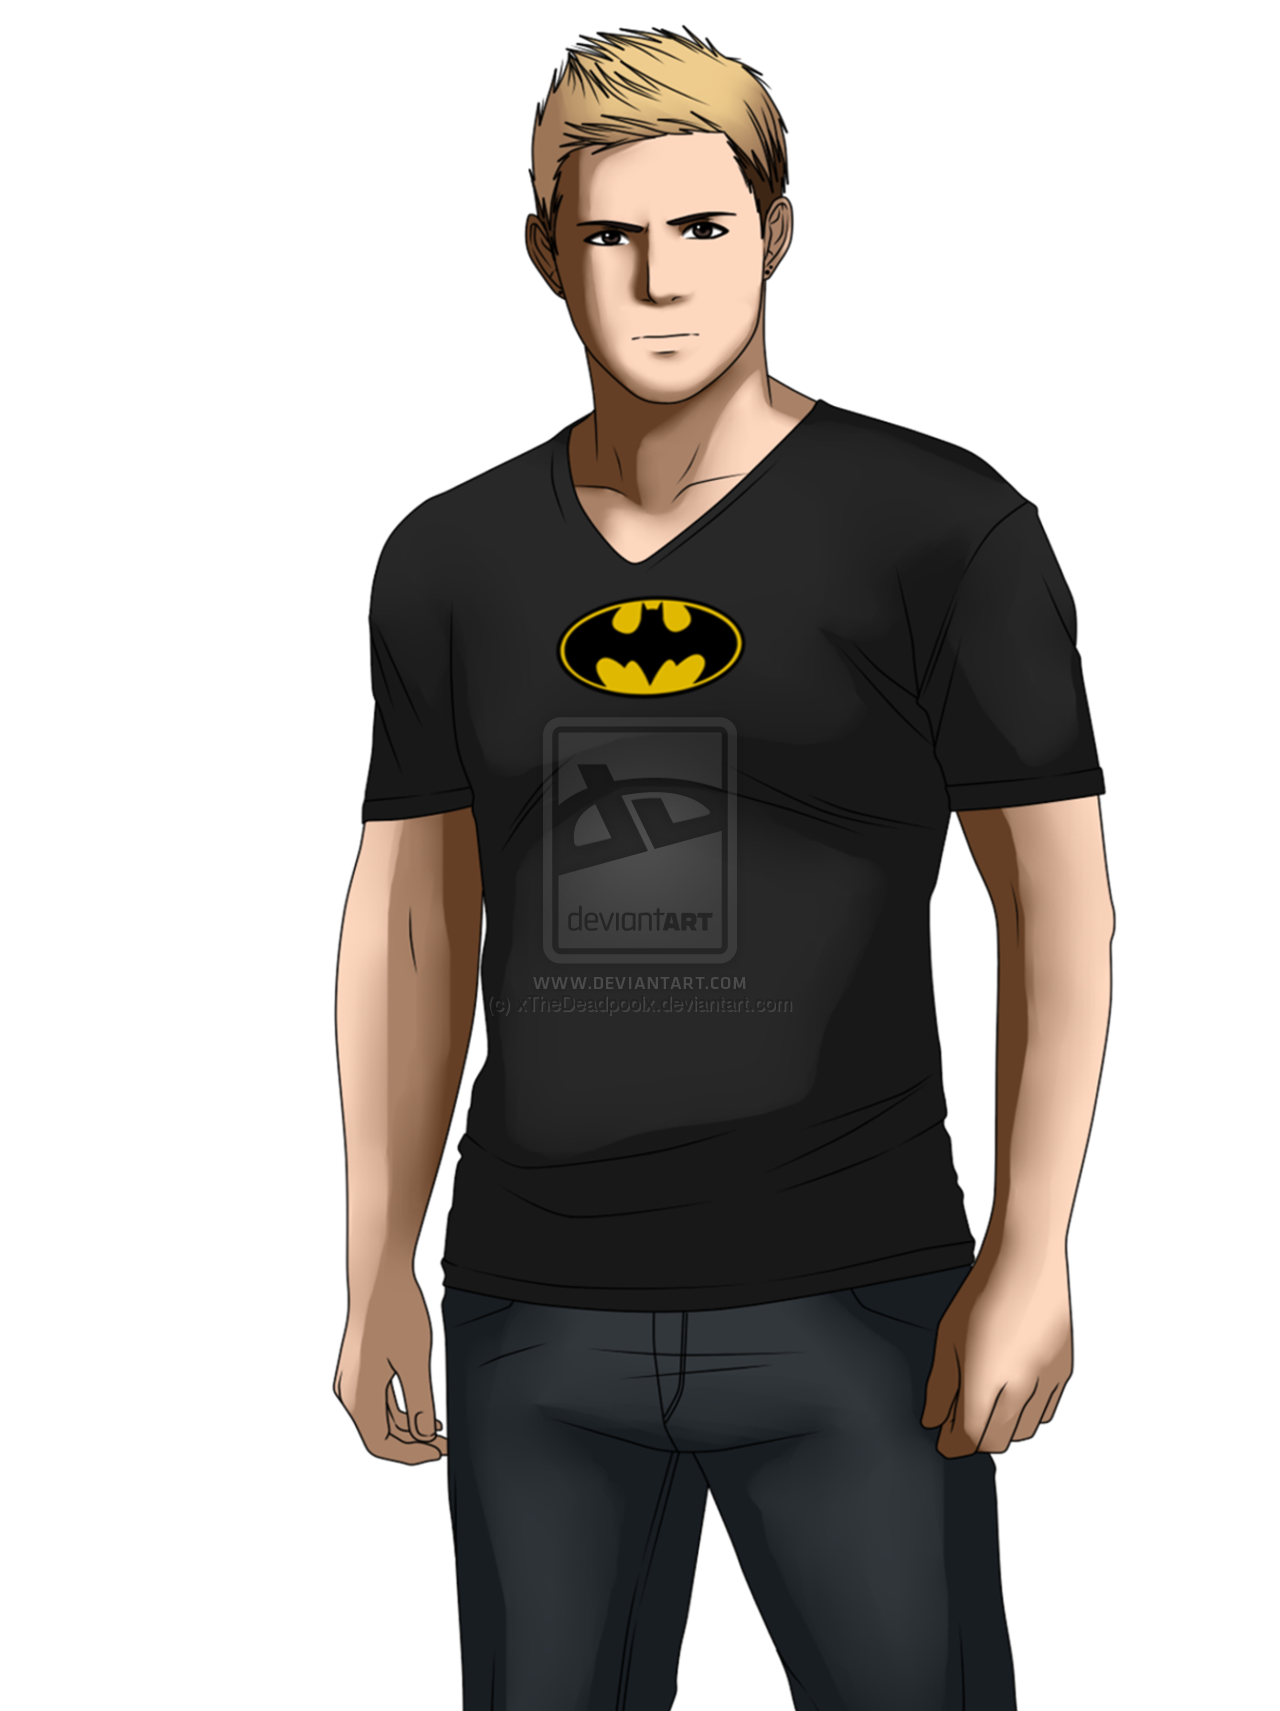 .Marvel Oc-.Seth Stark-Rogers. by xTheDeadpoolx.deviantart.com on @deviantART